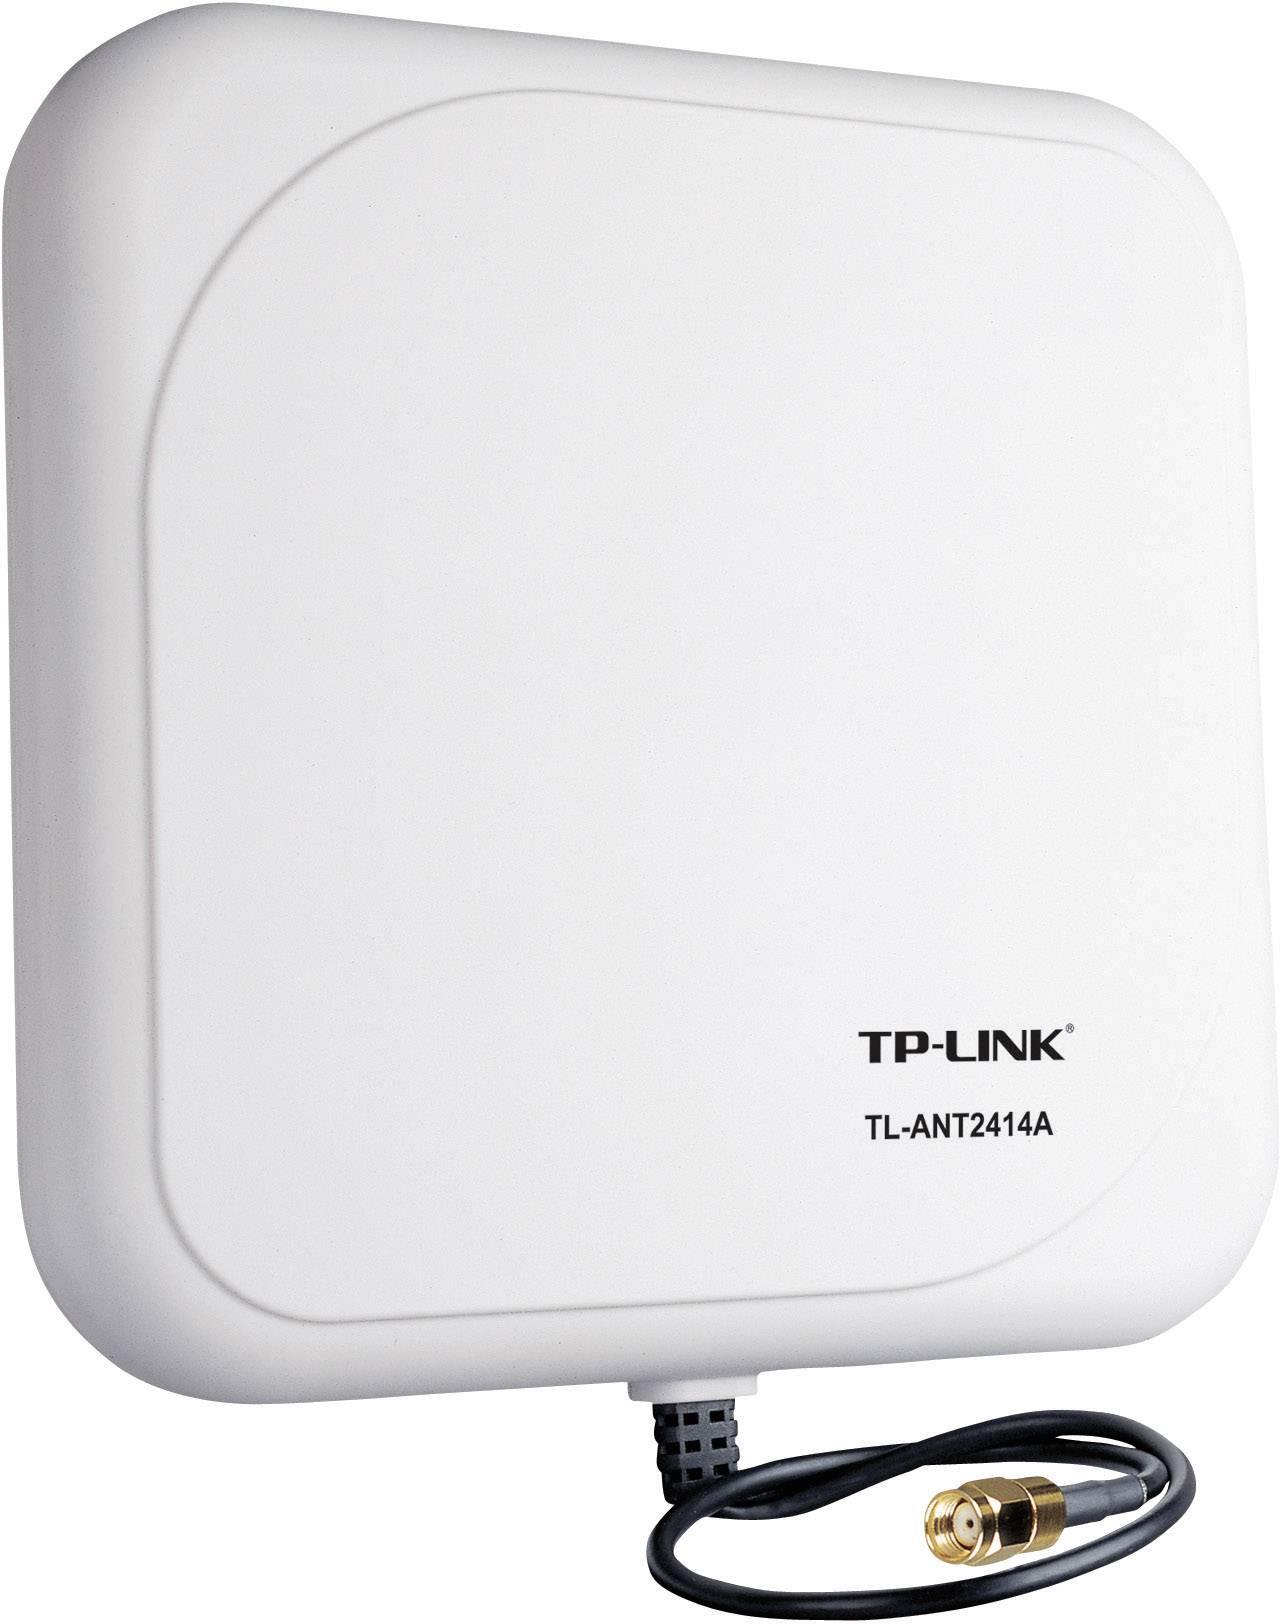 Wlan anténa, 14 dBi, 2,4 GHz, TP-Link TL-ANT2414A